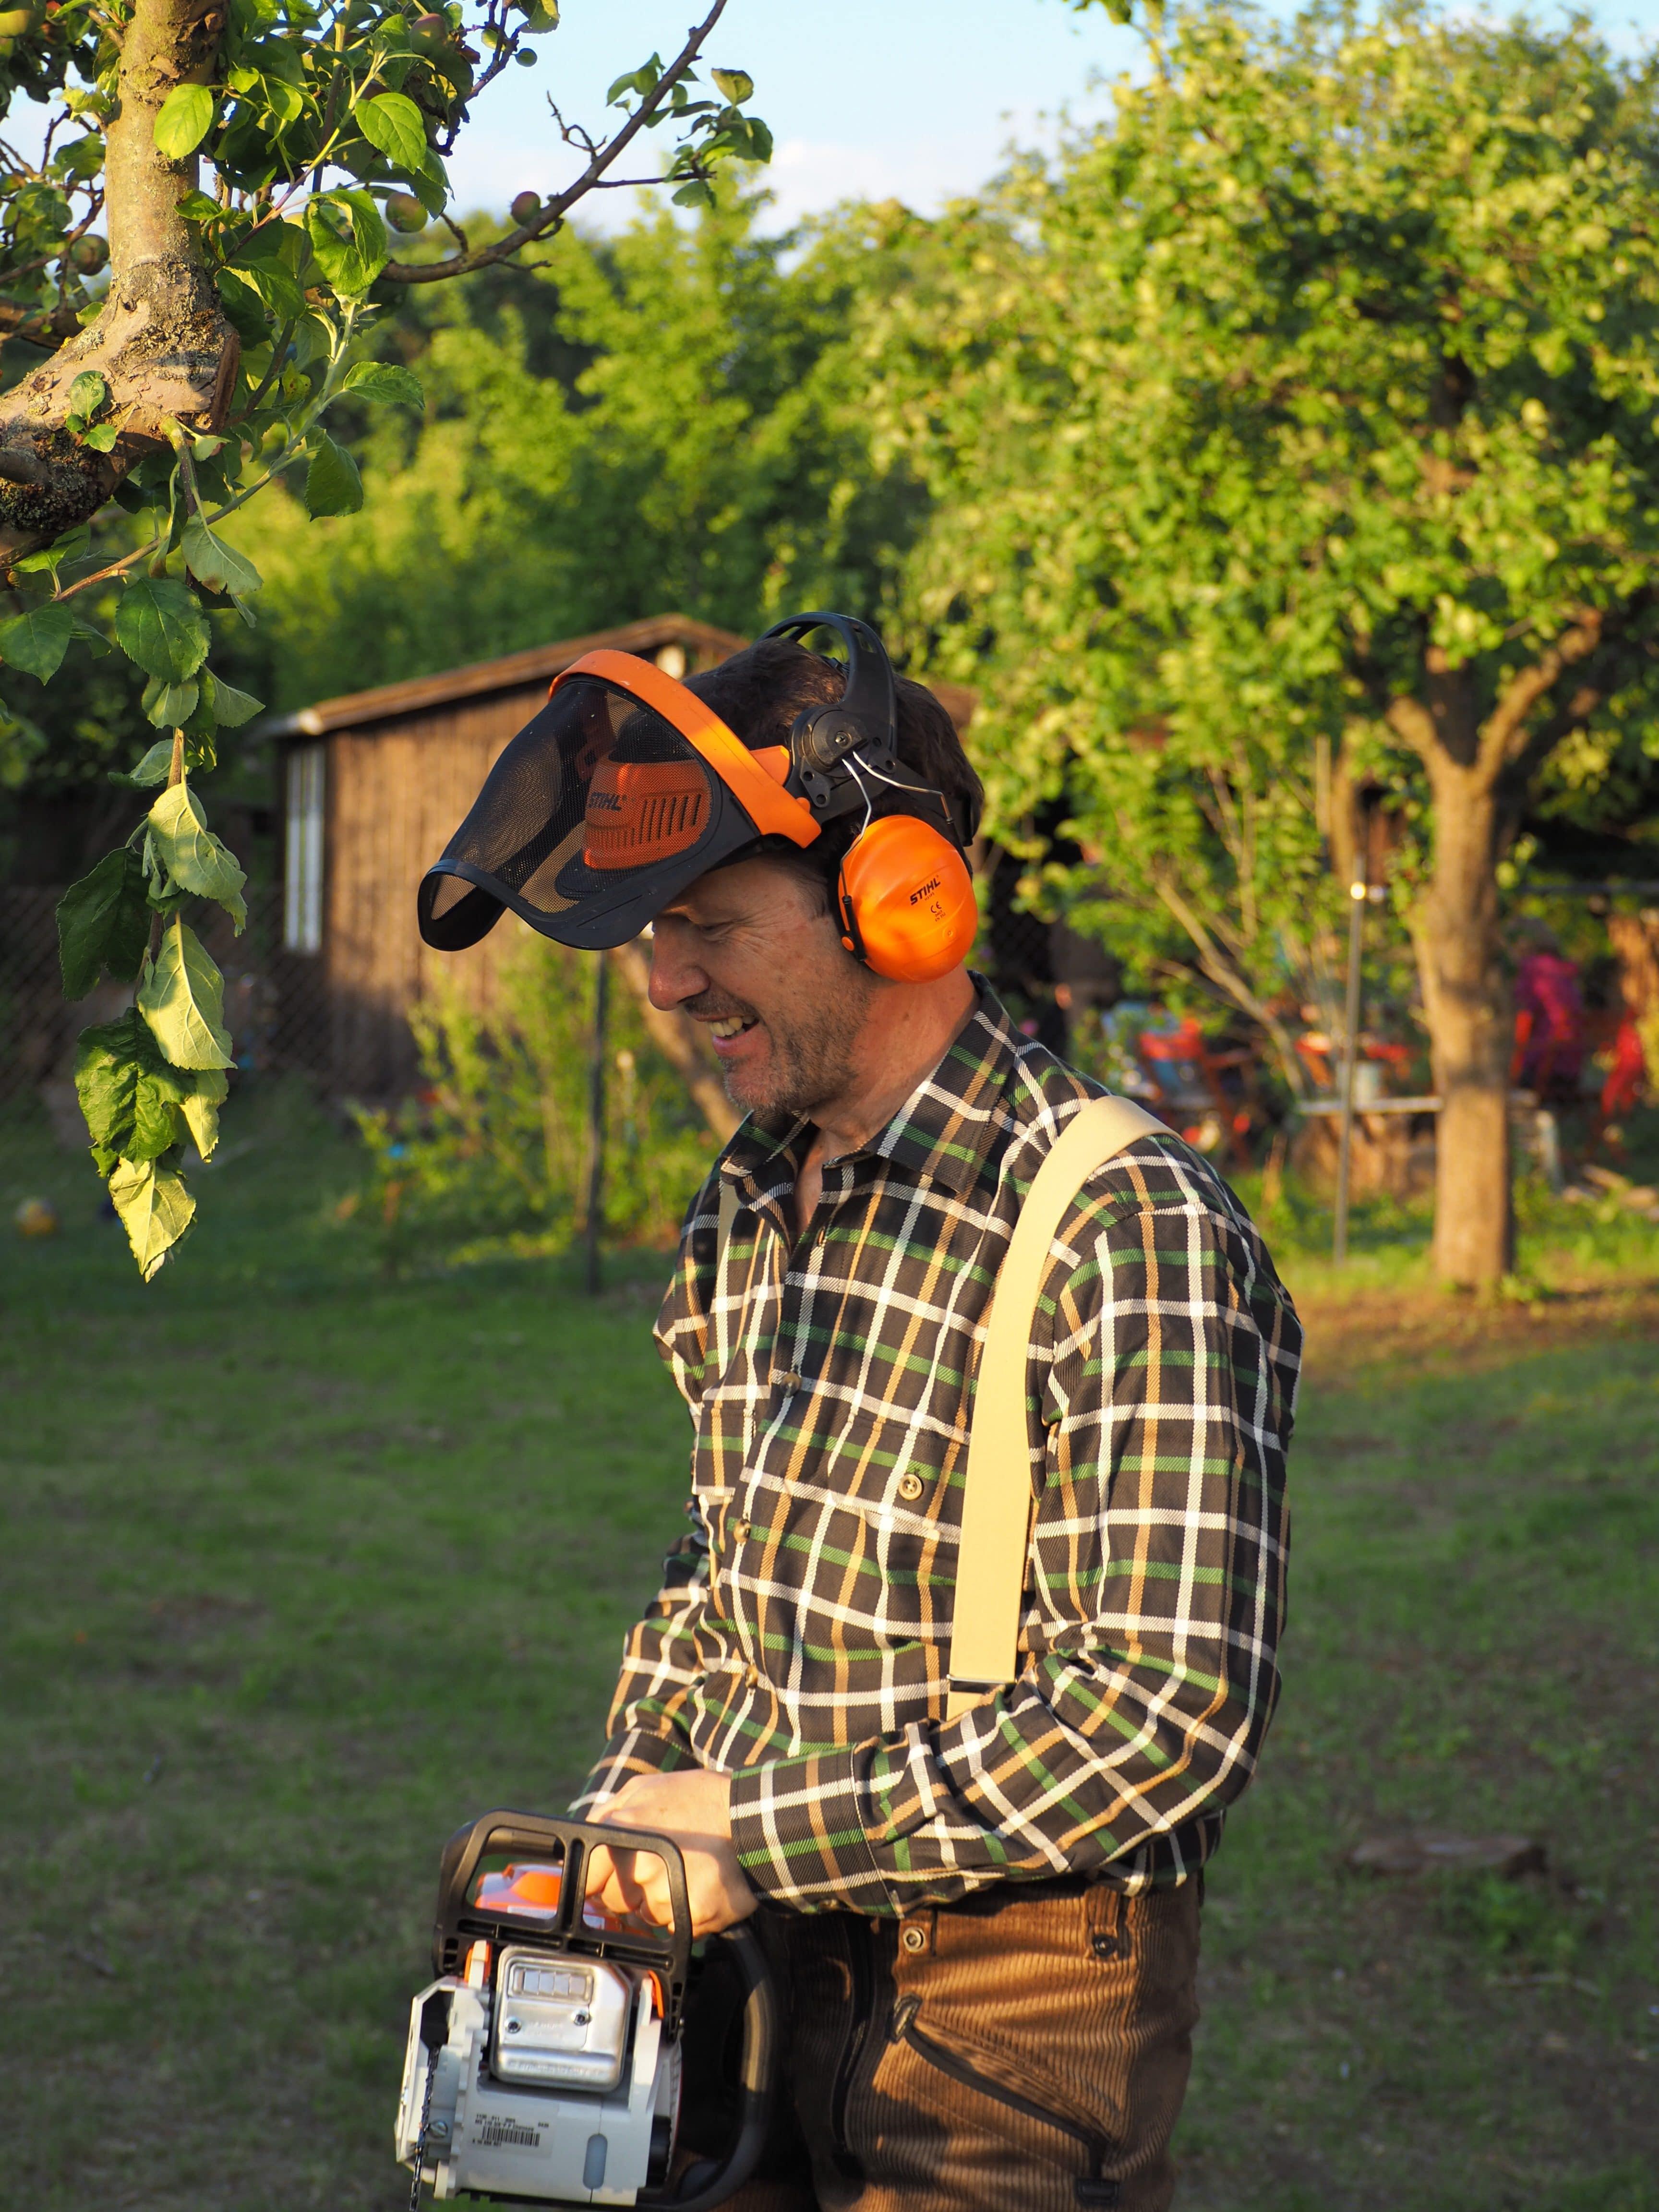 Gartenarbeiten, Baumpfleger, Planung für den Feinschliff